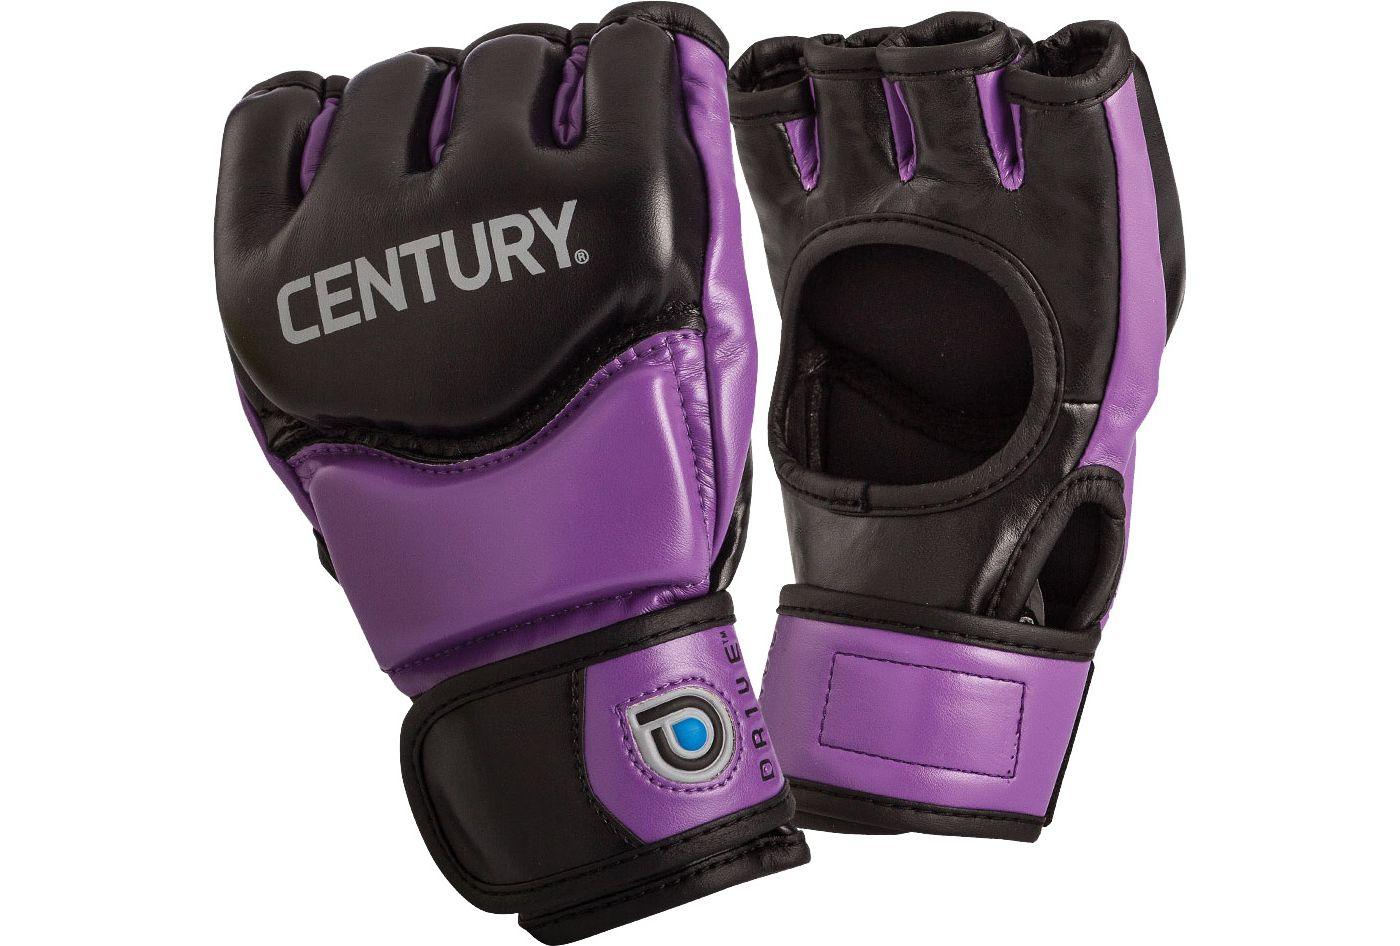 Century Women's DRIVE Fight Gloves